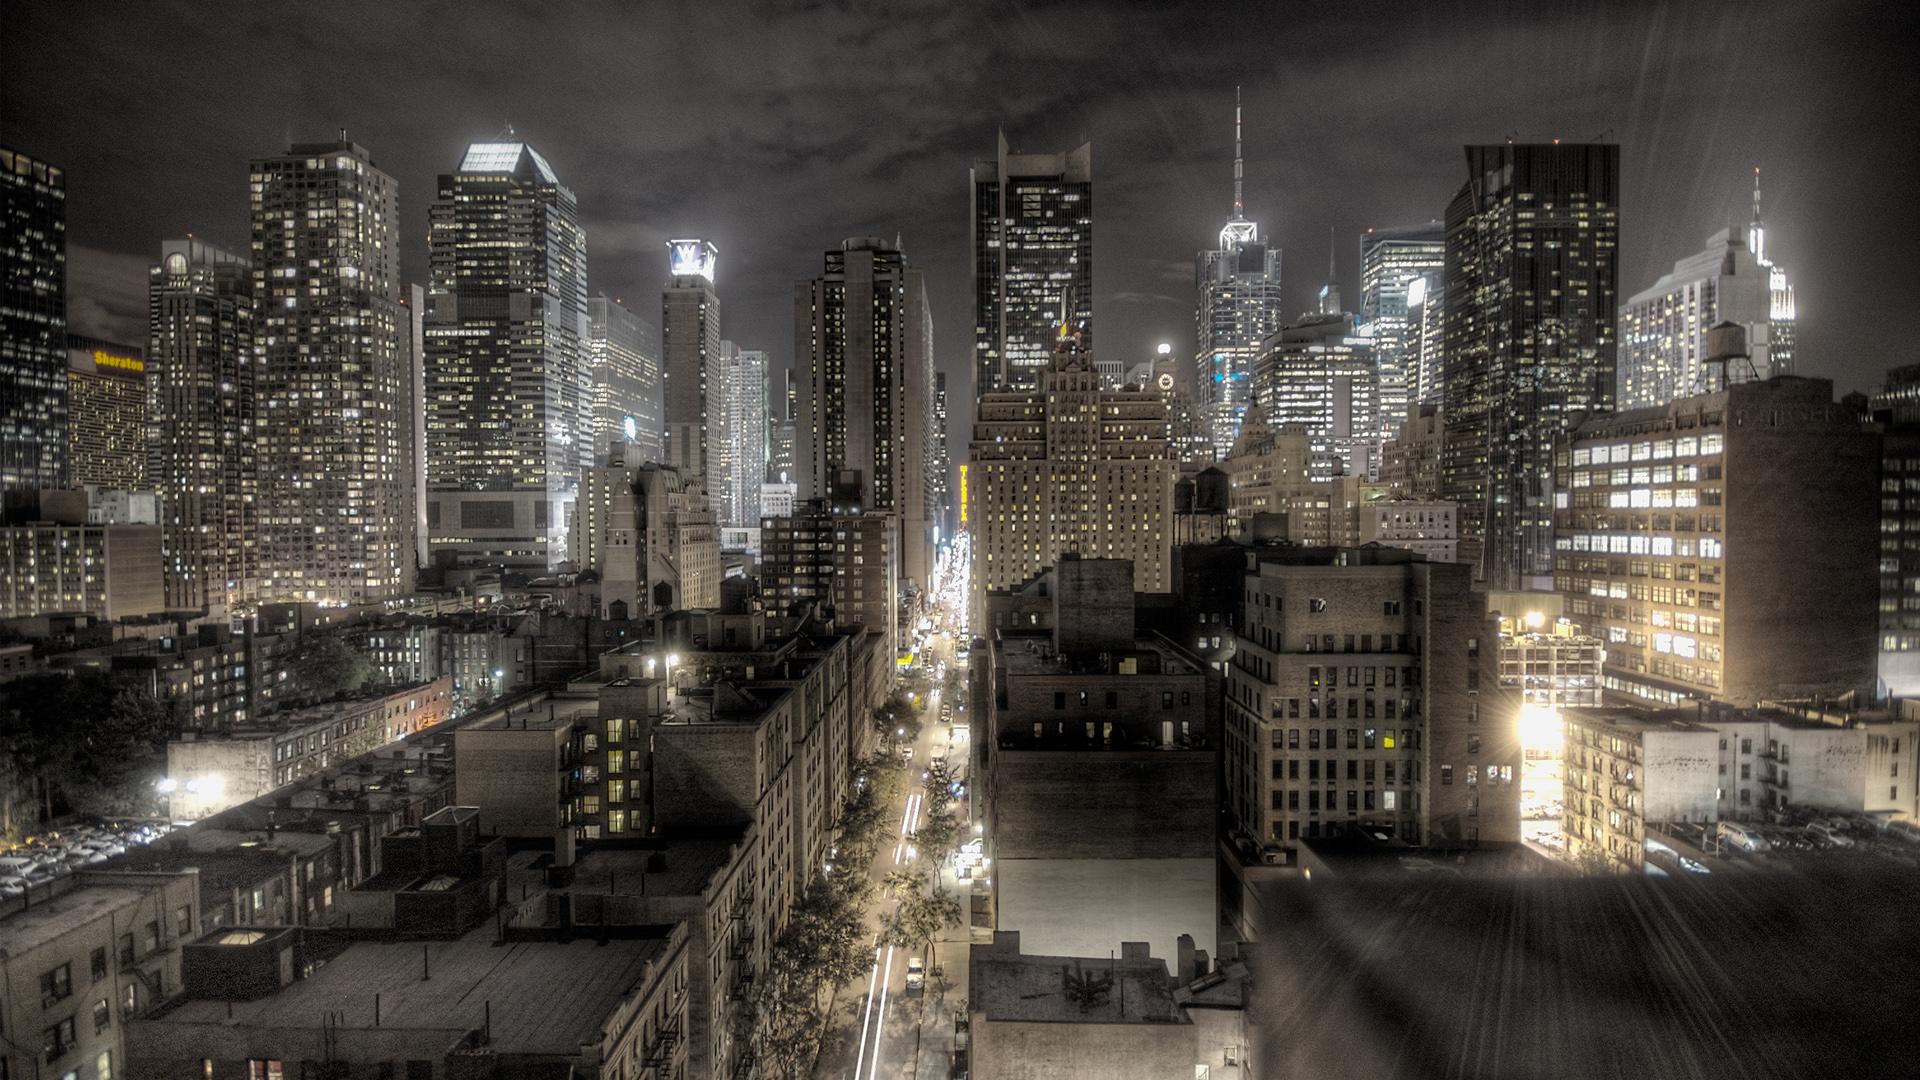 City at Night Wallpaper 1920x1080